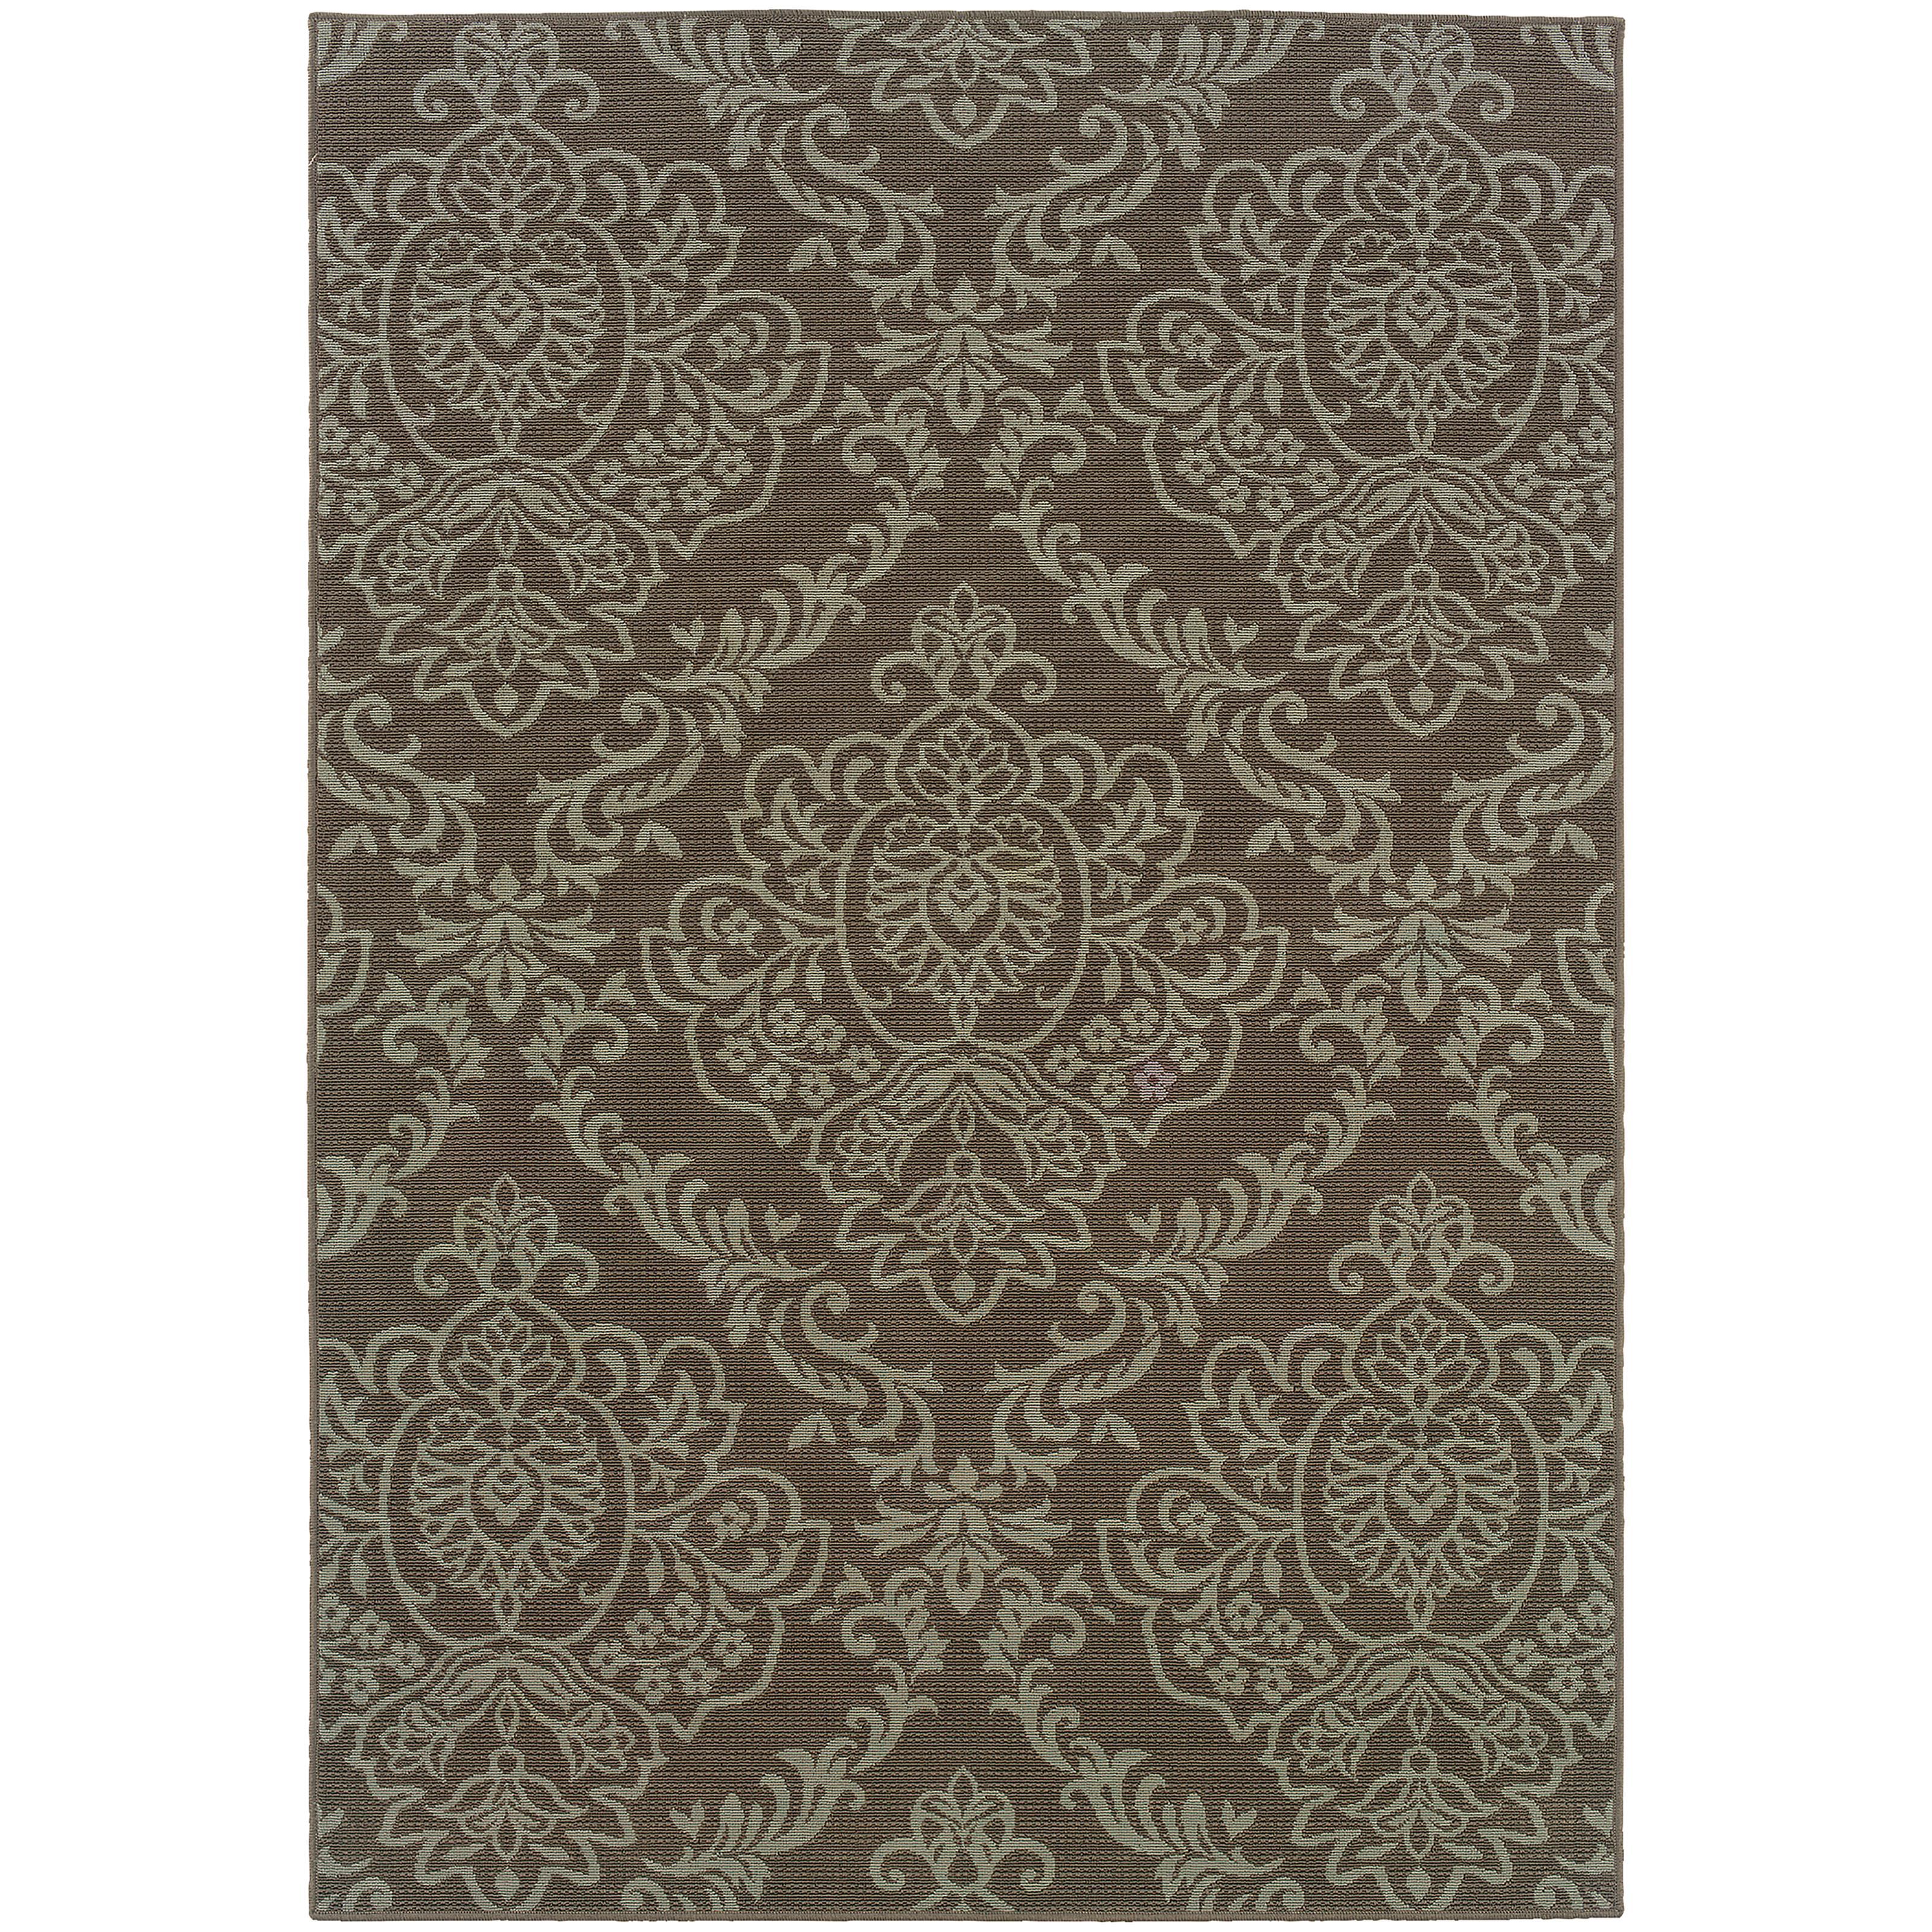 "Bali 5' 3"" X  7' 6"" Rug by Oriental Weavers at Steger's Furniture"